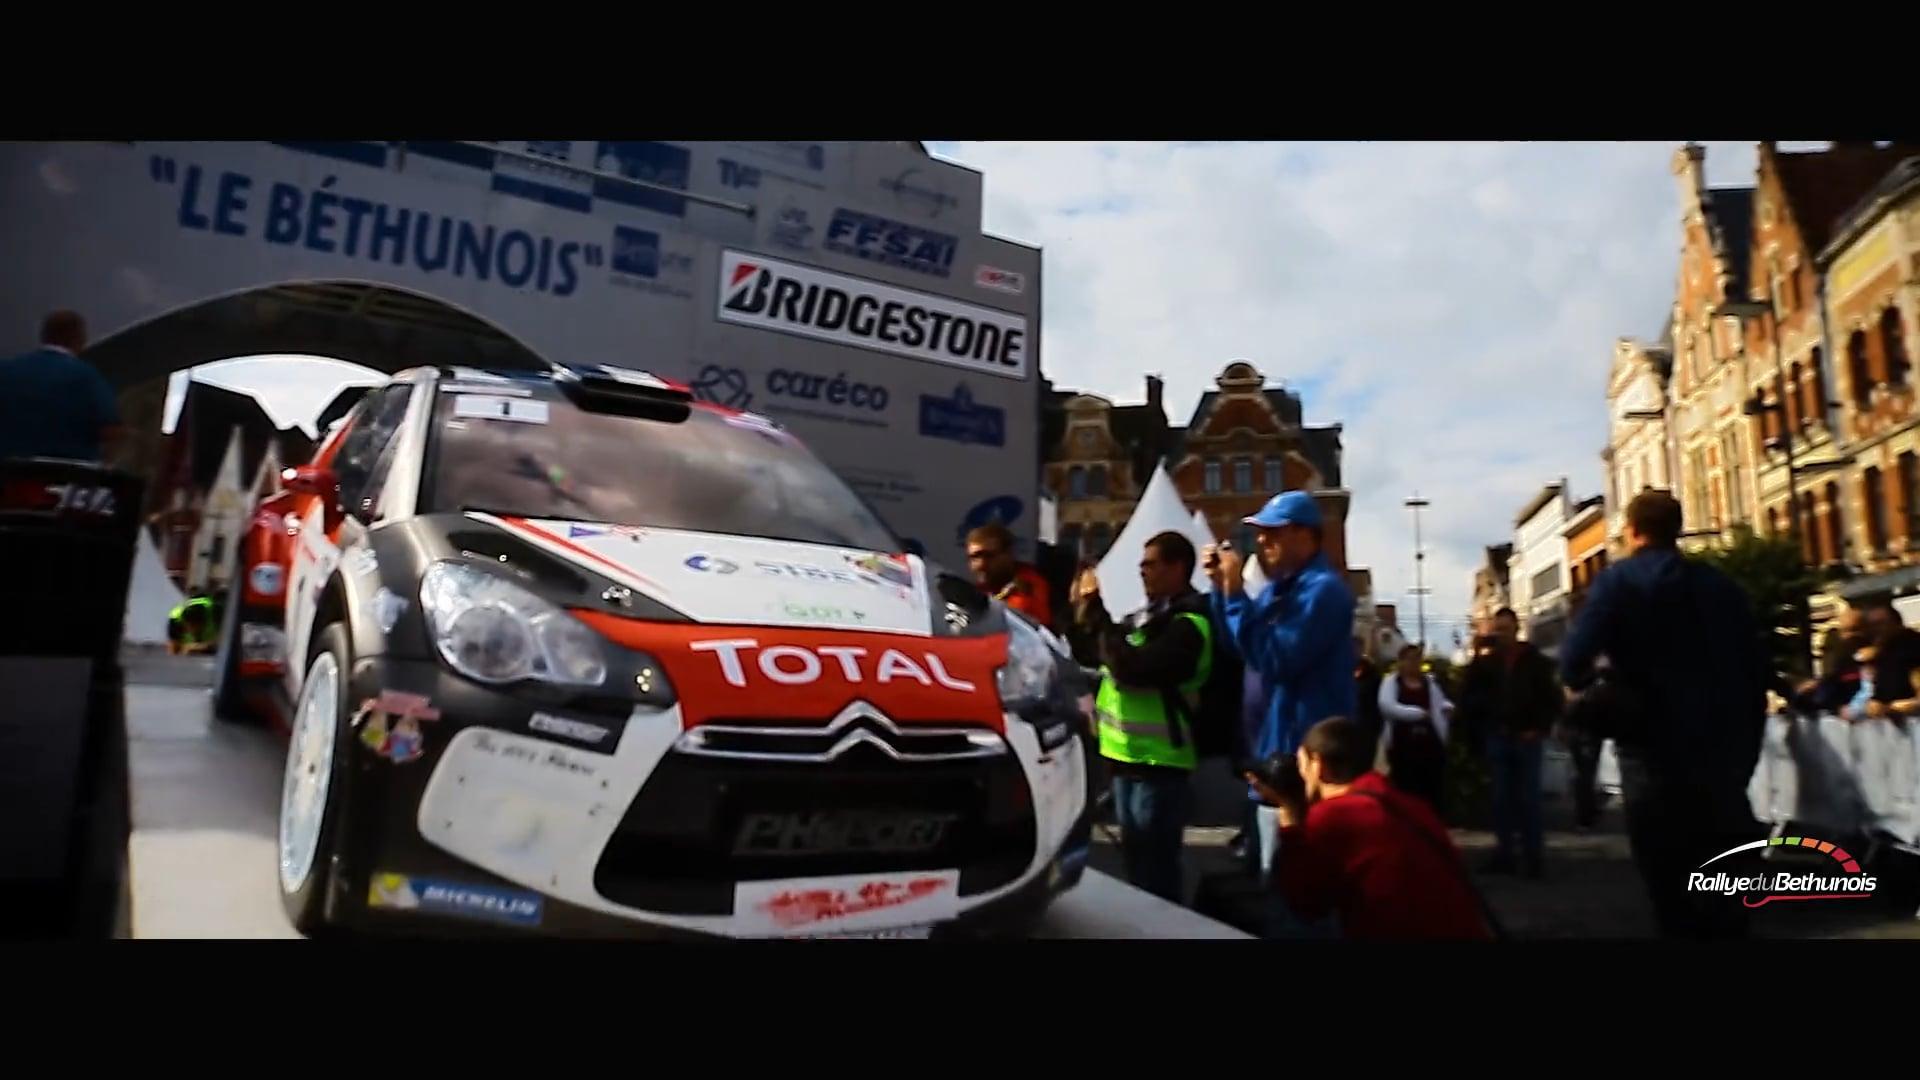 Rallye le Béthunois - 40ème Edition